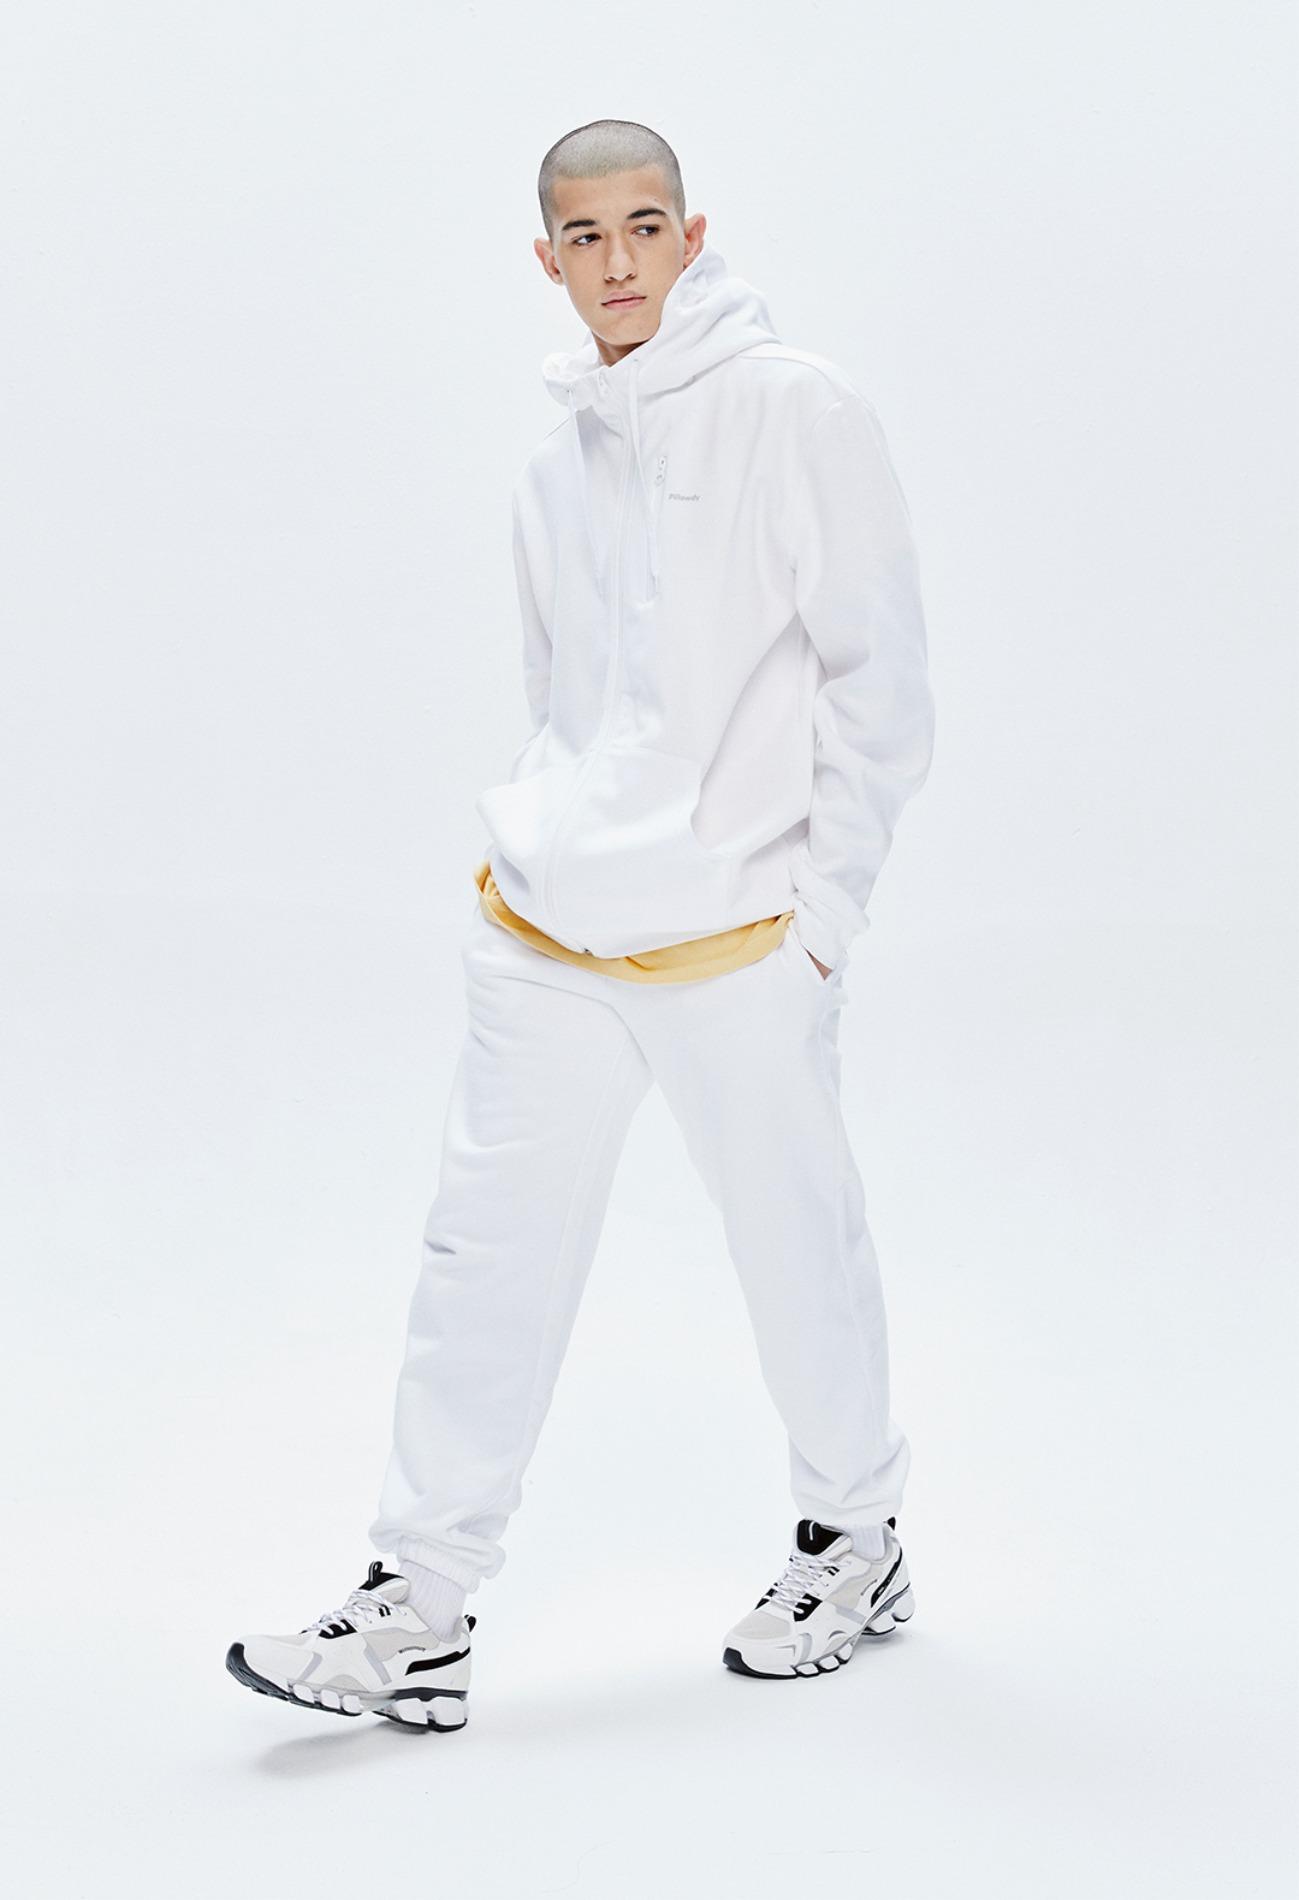 keek Pillowdy Hoodie(Basic, Regular Fit) - White 스트릿패션 유니섹스브랜드 커플시밀러룩 남자쇼핑몰 여성의류쇼핑몰 후드티 힙색